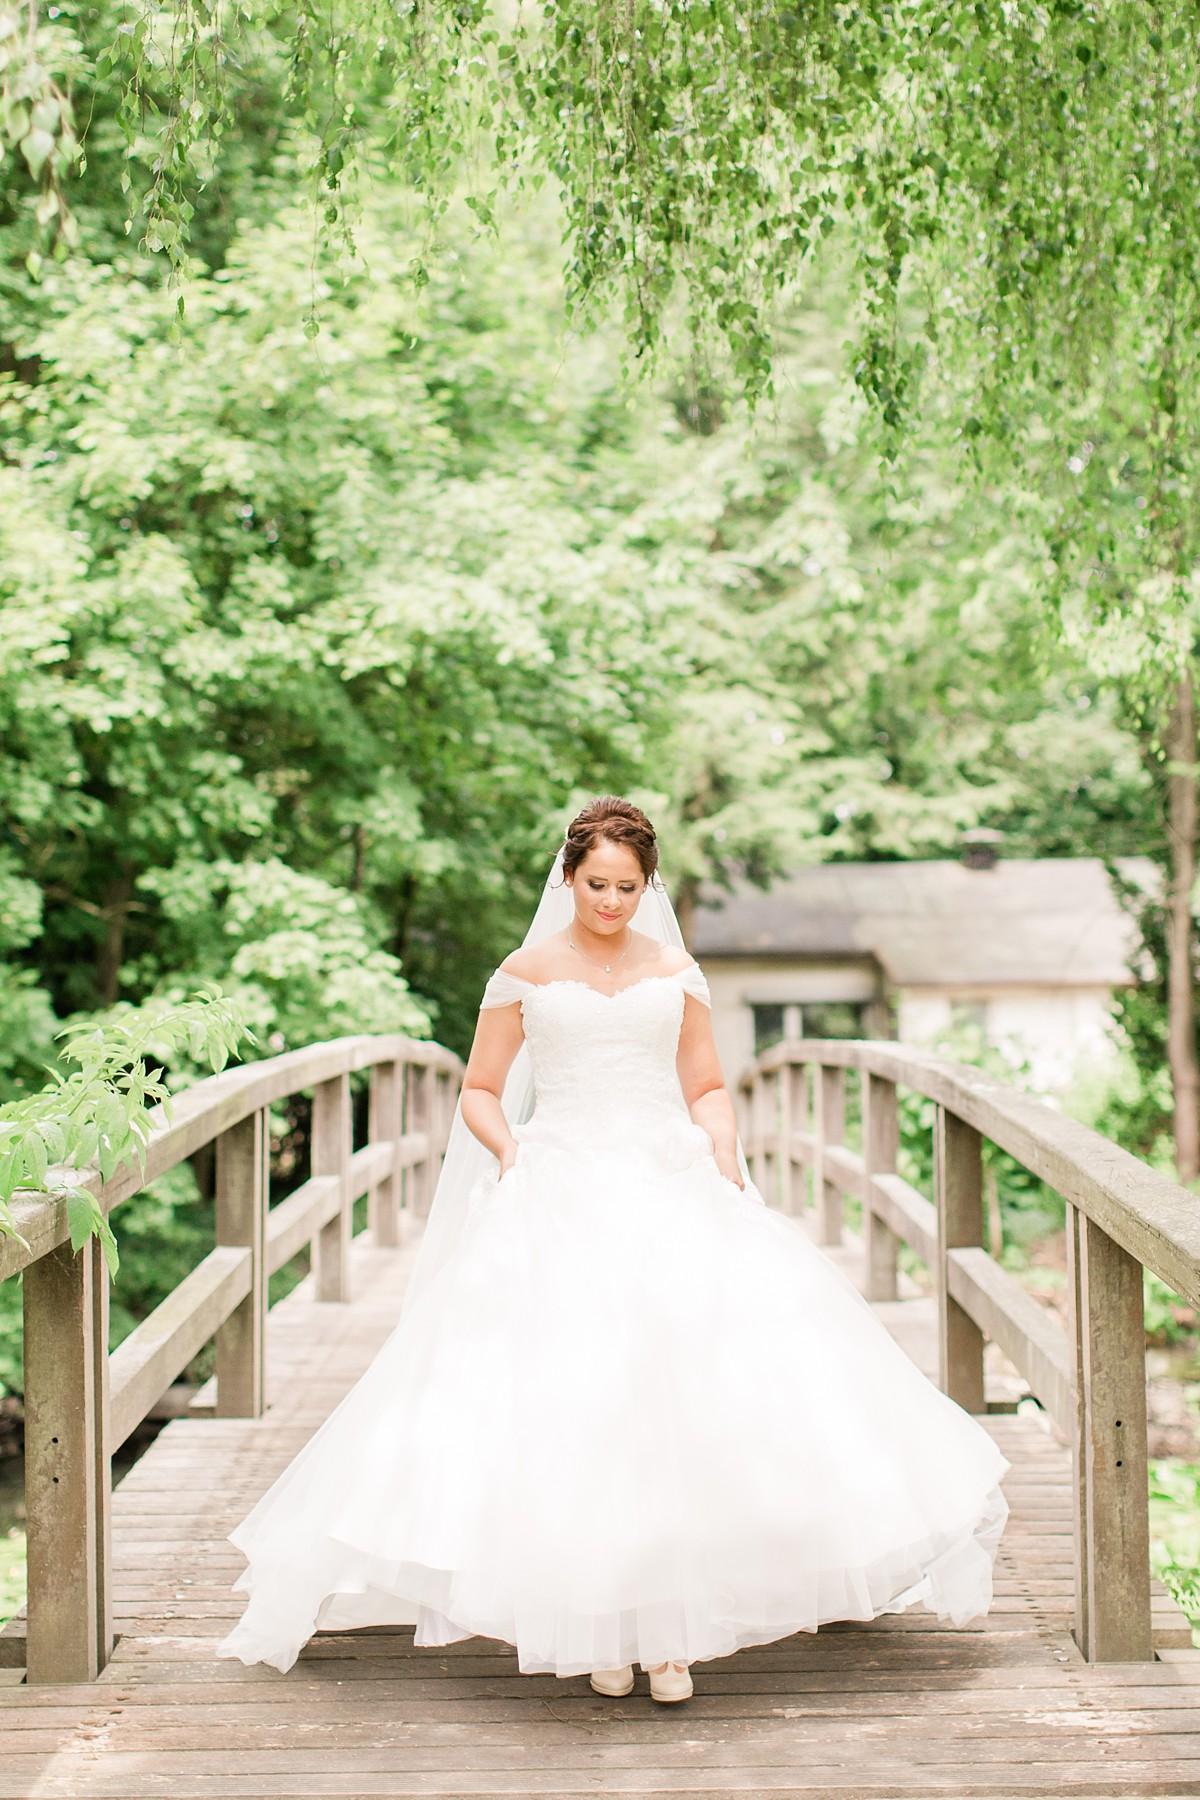 Hochzeitsfotograf-Bünde-Hücker-Moor-Fotograf-Moor-Ranch_0132